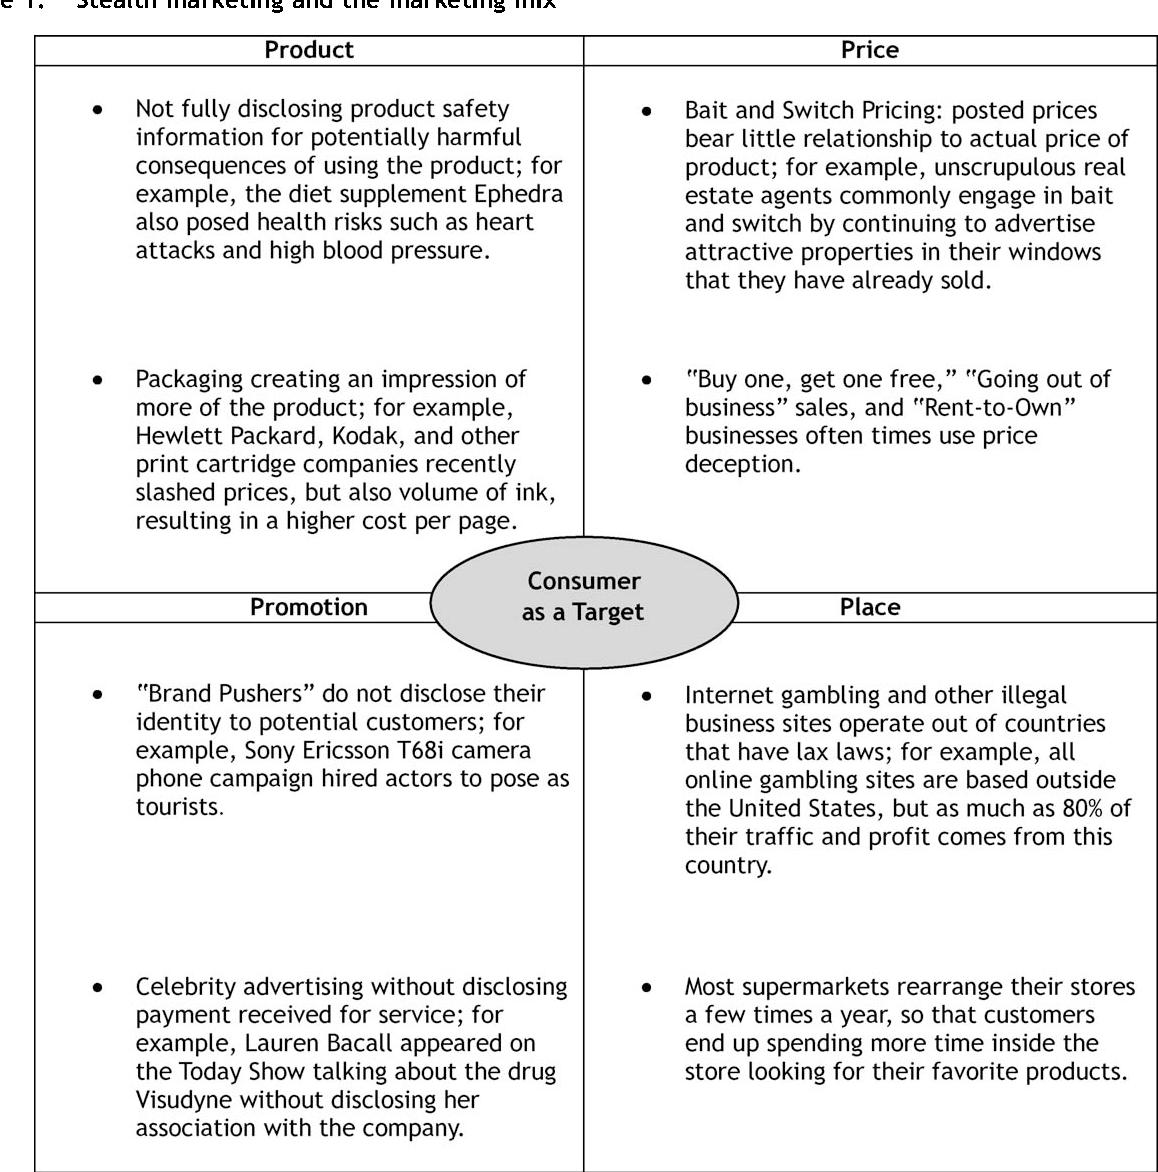 Stealth marketing as a strategy - Semantic Scholar